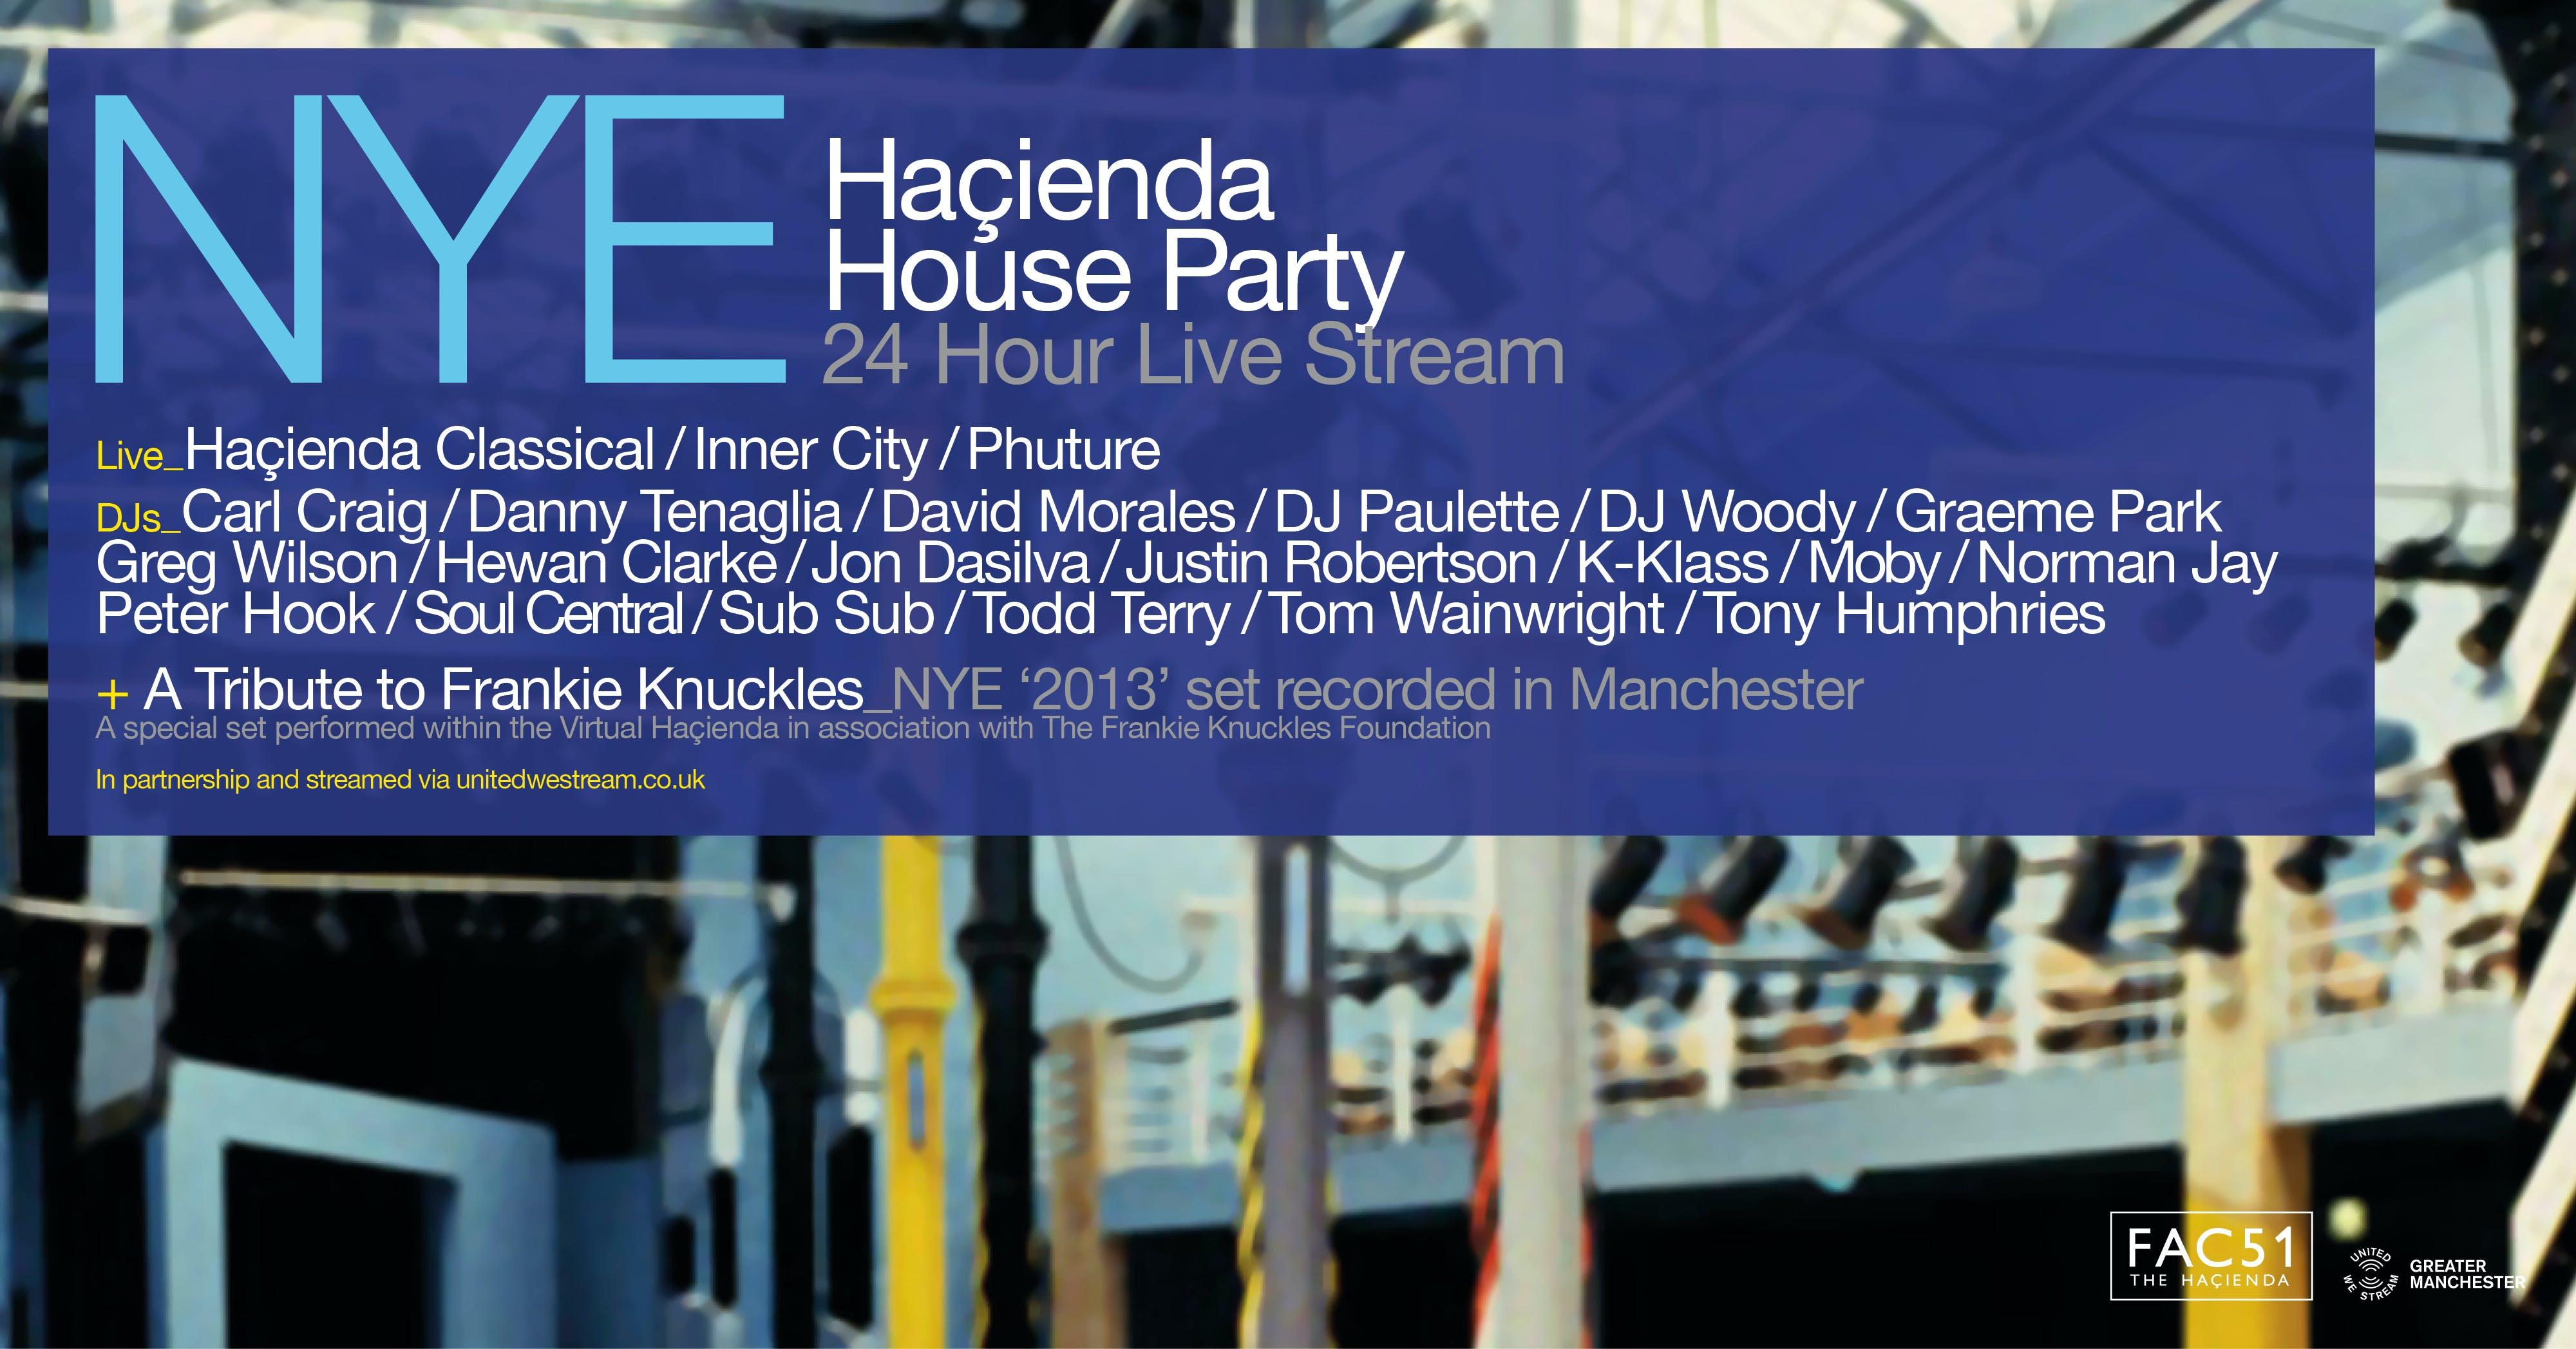 THE HACIENDA 24 HOUR HOUSE PARTY NYE